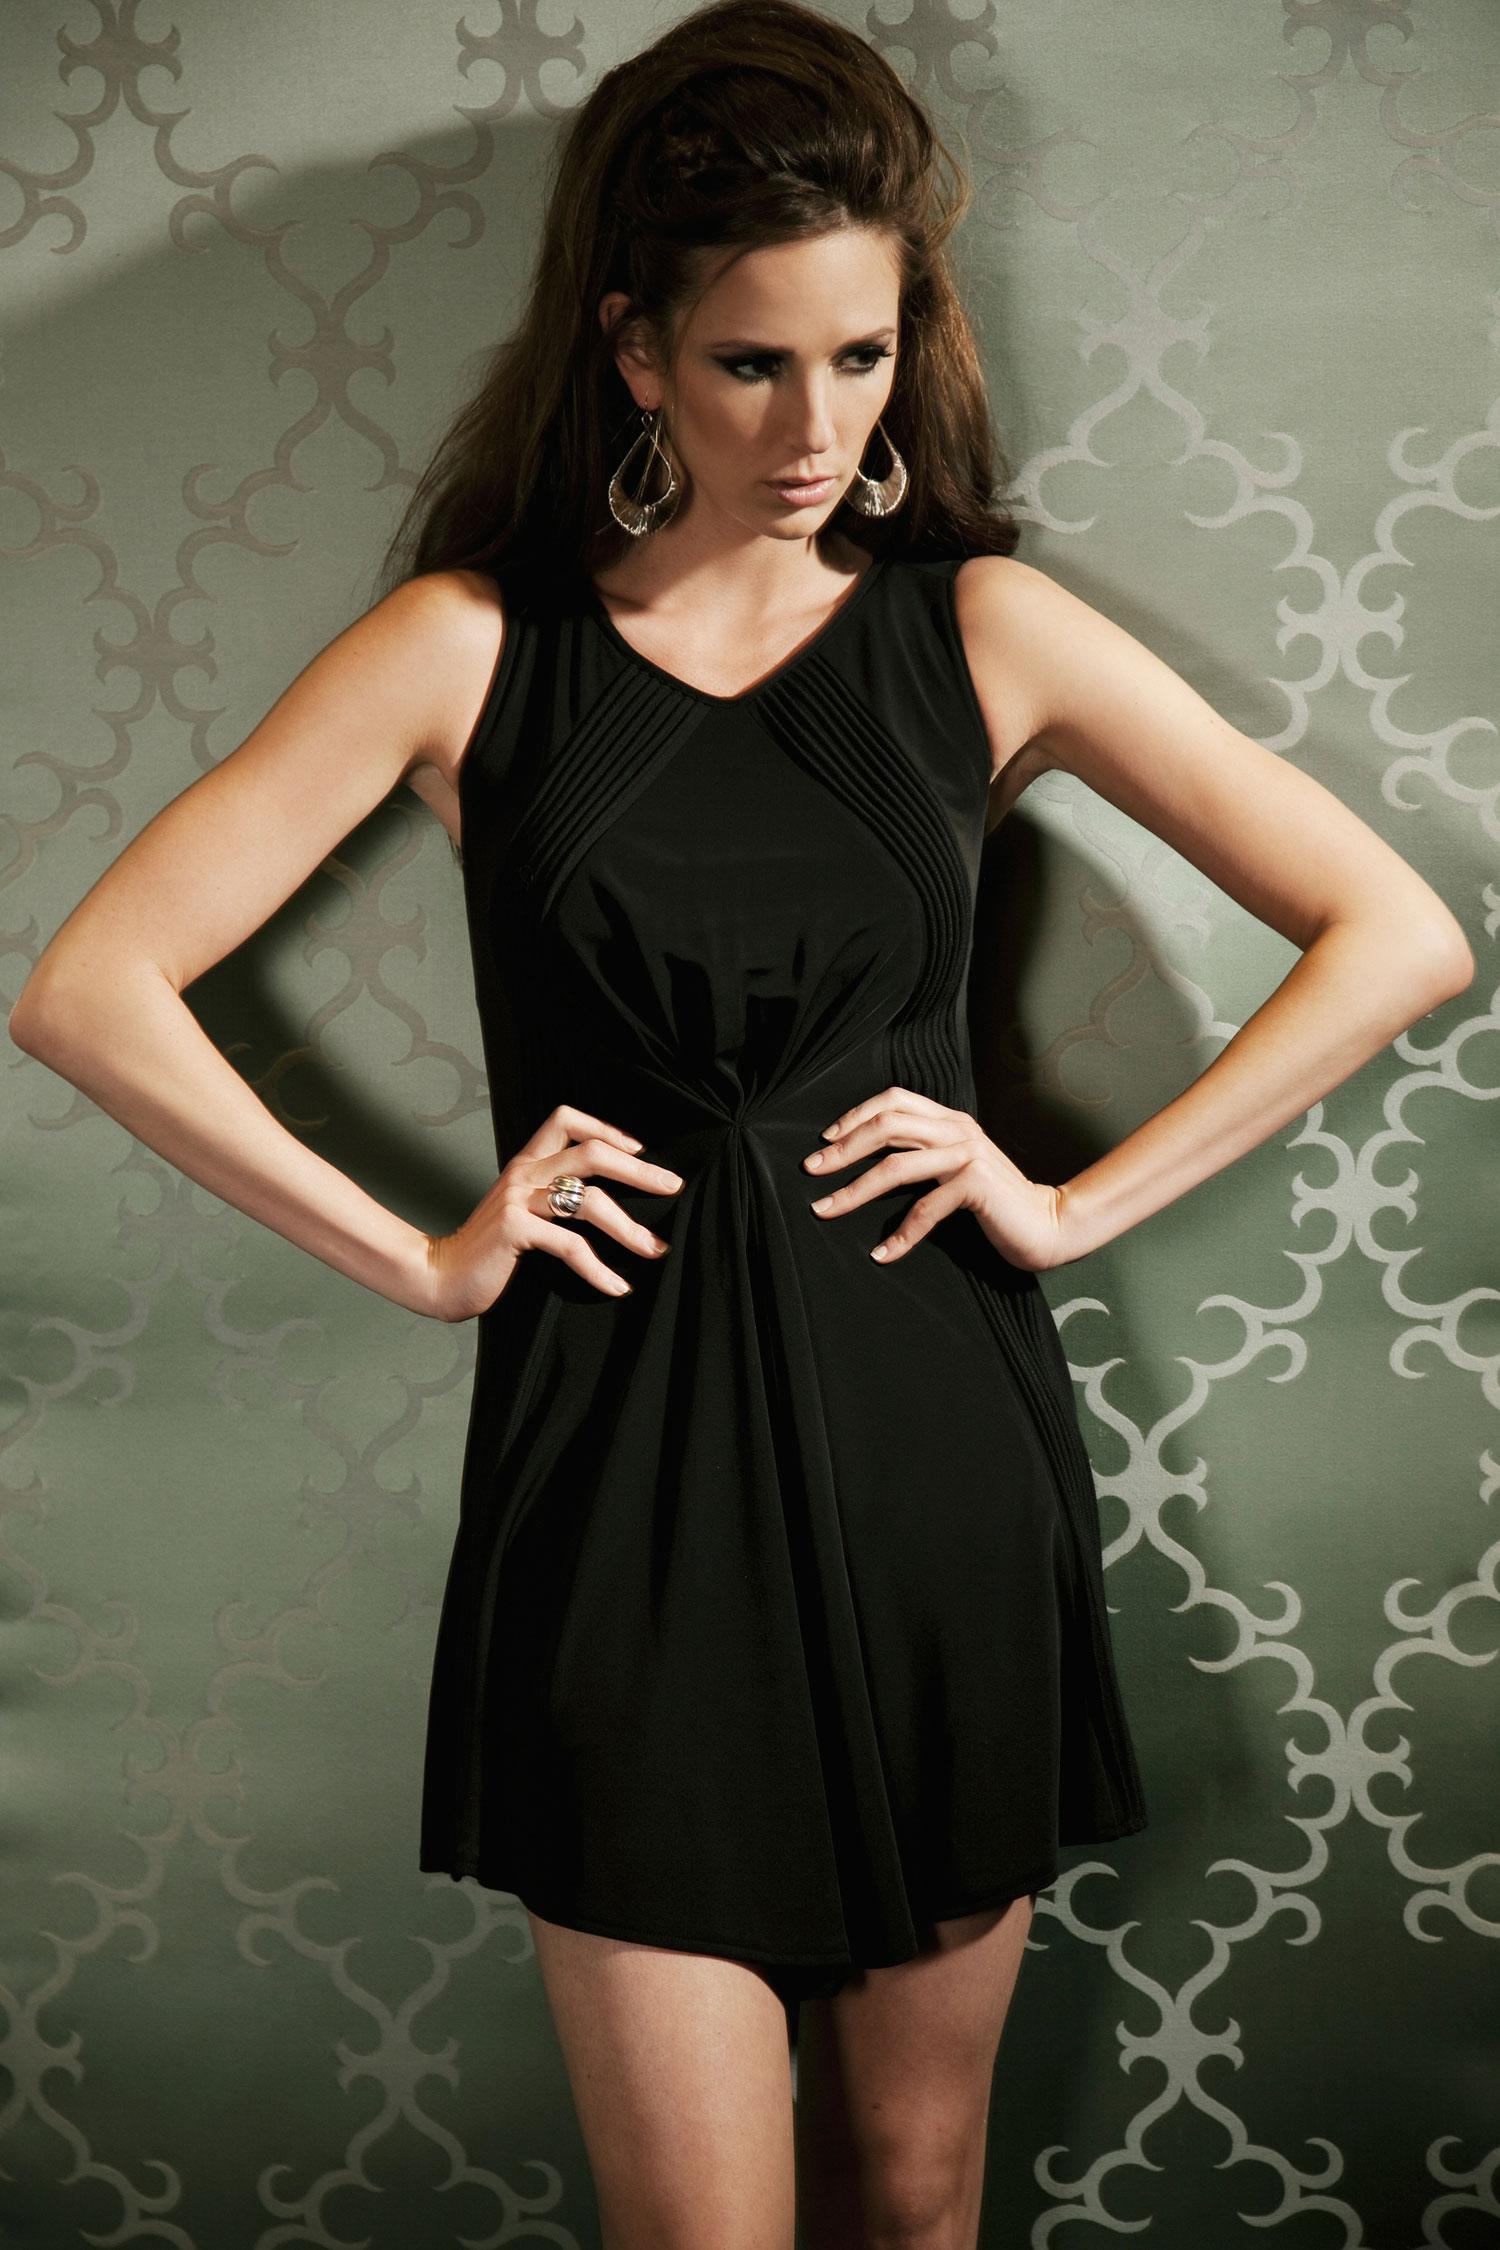 Z-Form-Uniform-Kelsy-Zimba-Dress-CD2-editorial.jpg